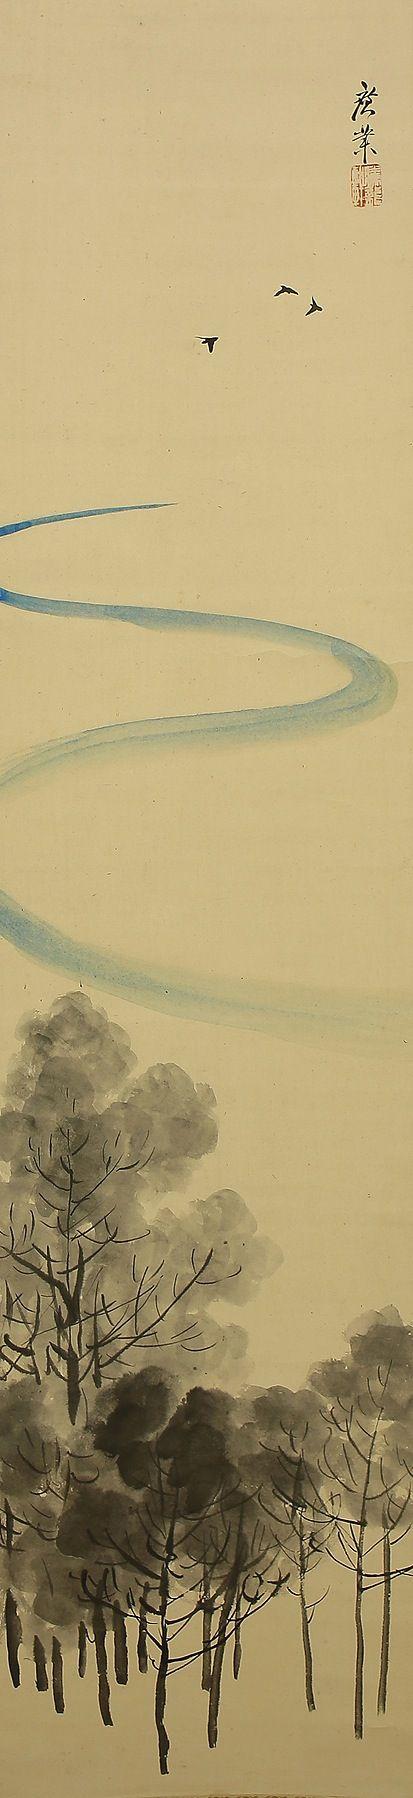 Terasaki Kôgyô 寺崎 広業 (1866 - 1919).